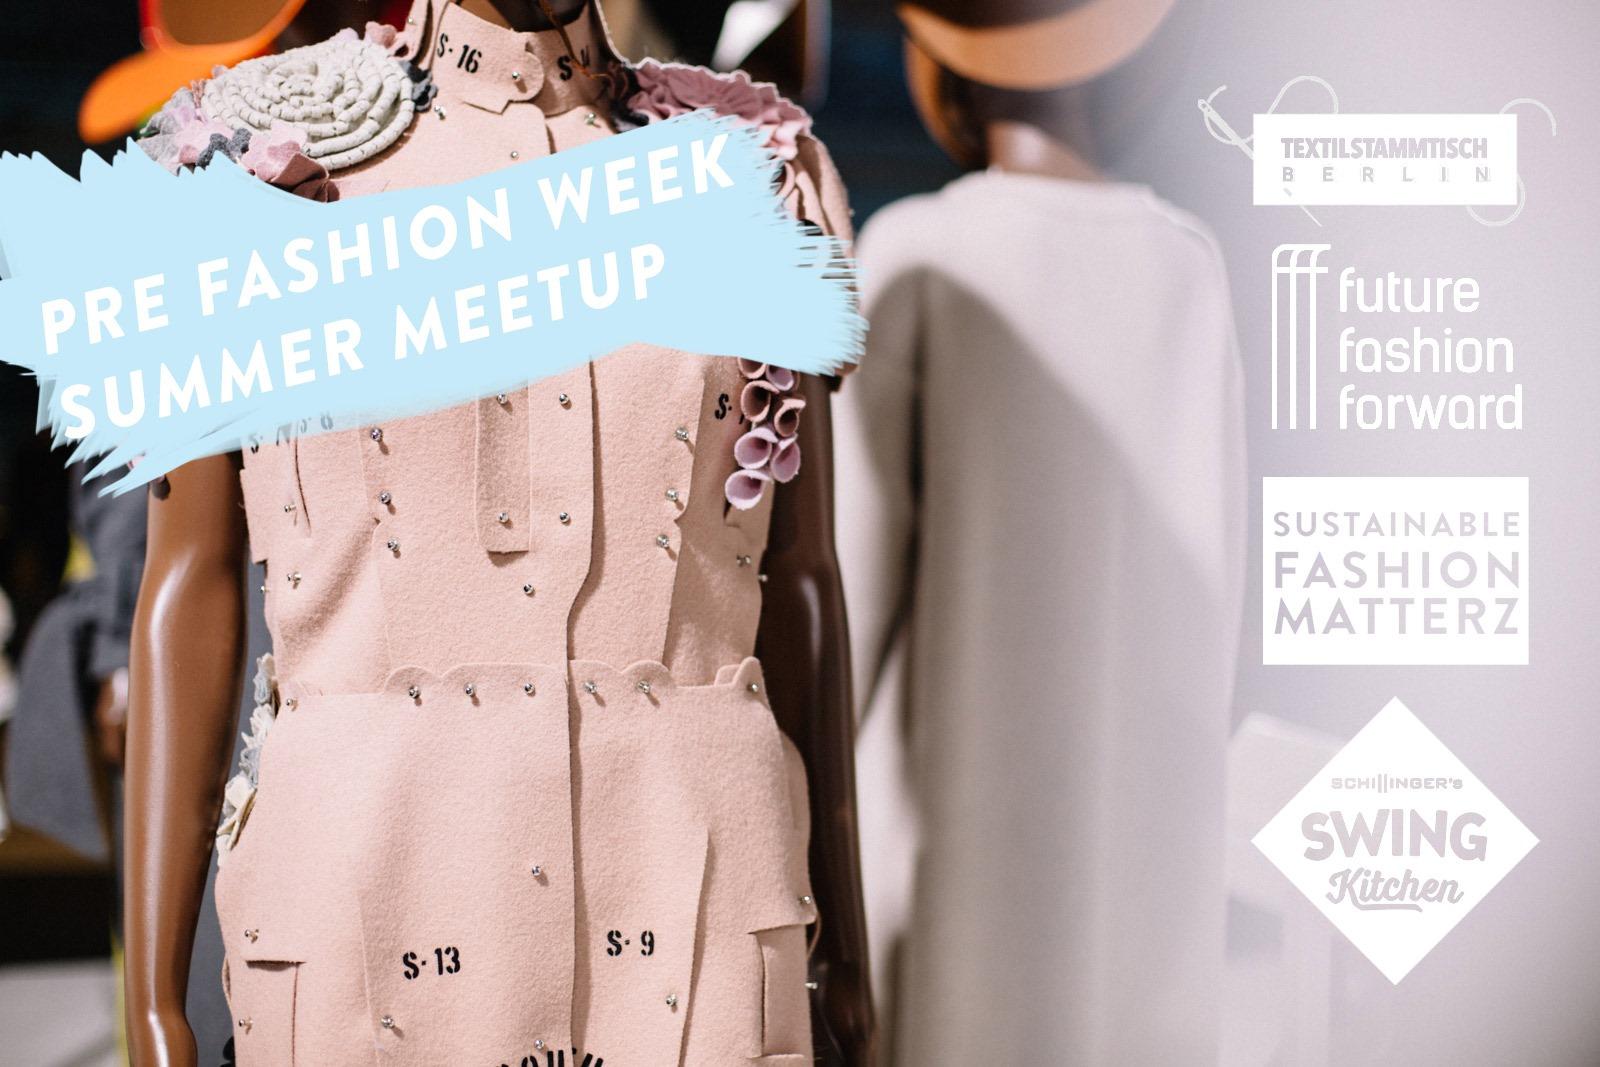 fashion-events-berlin-swing-kitchen